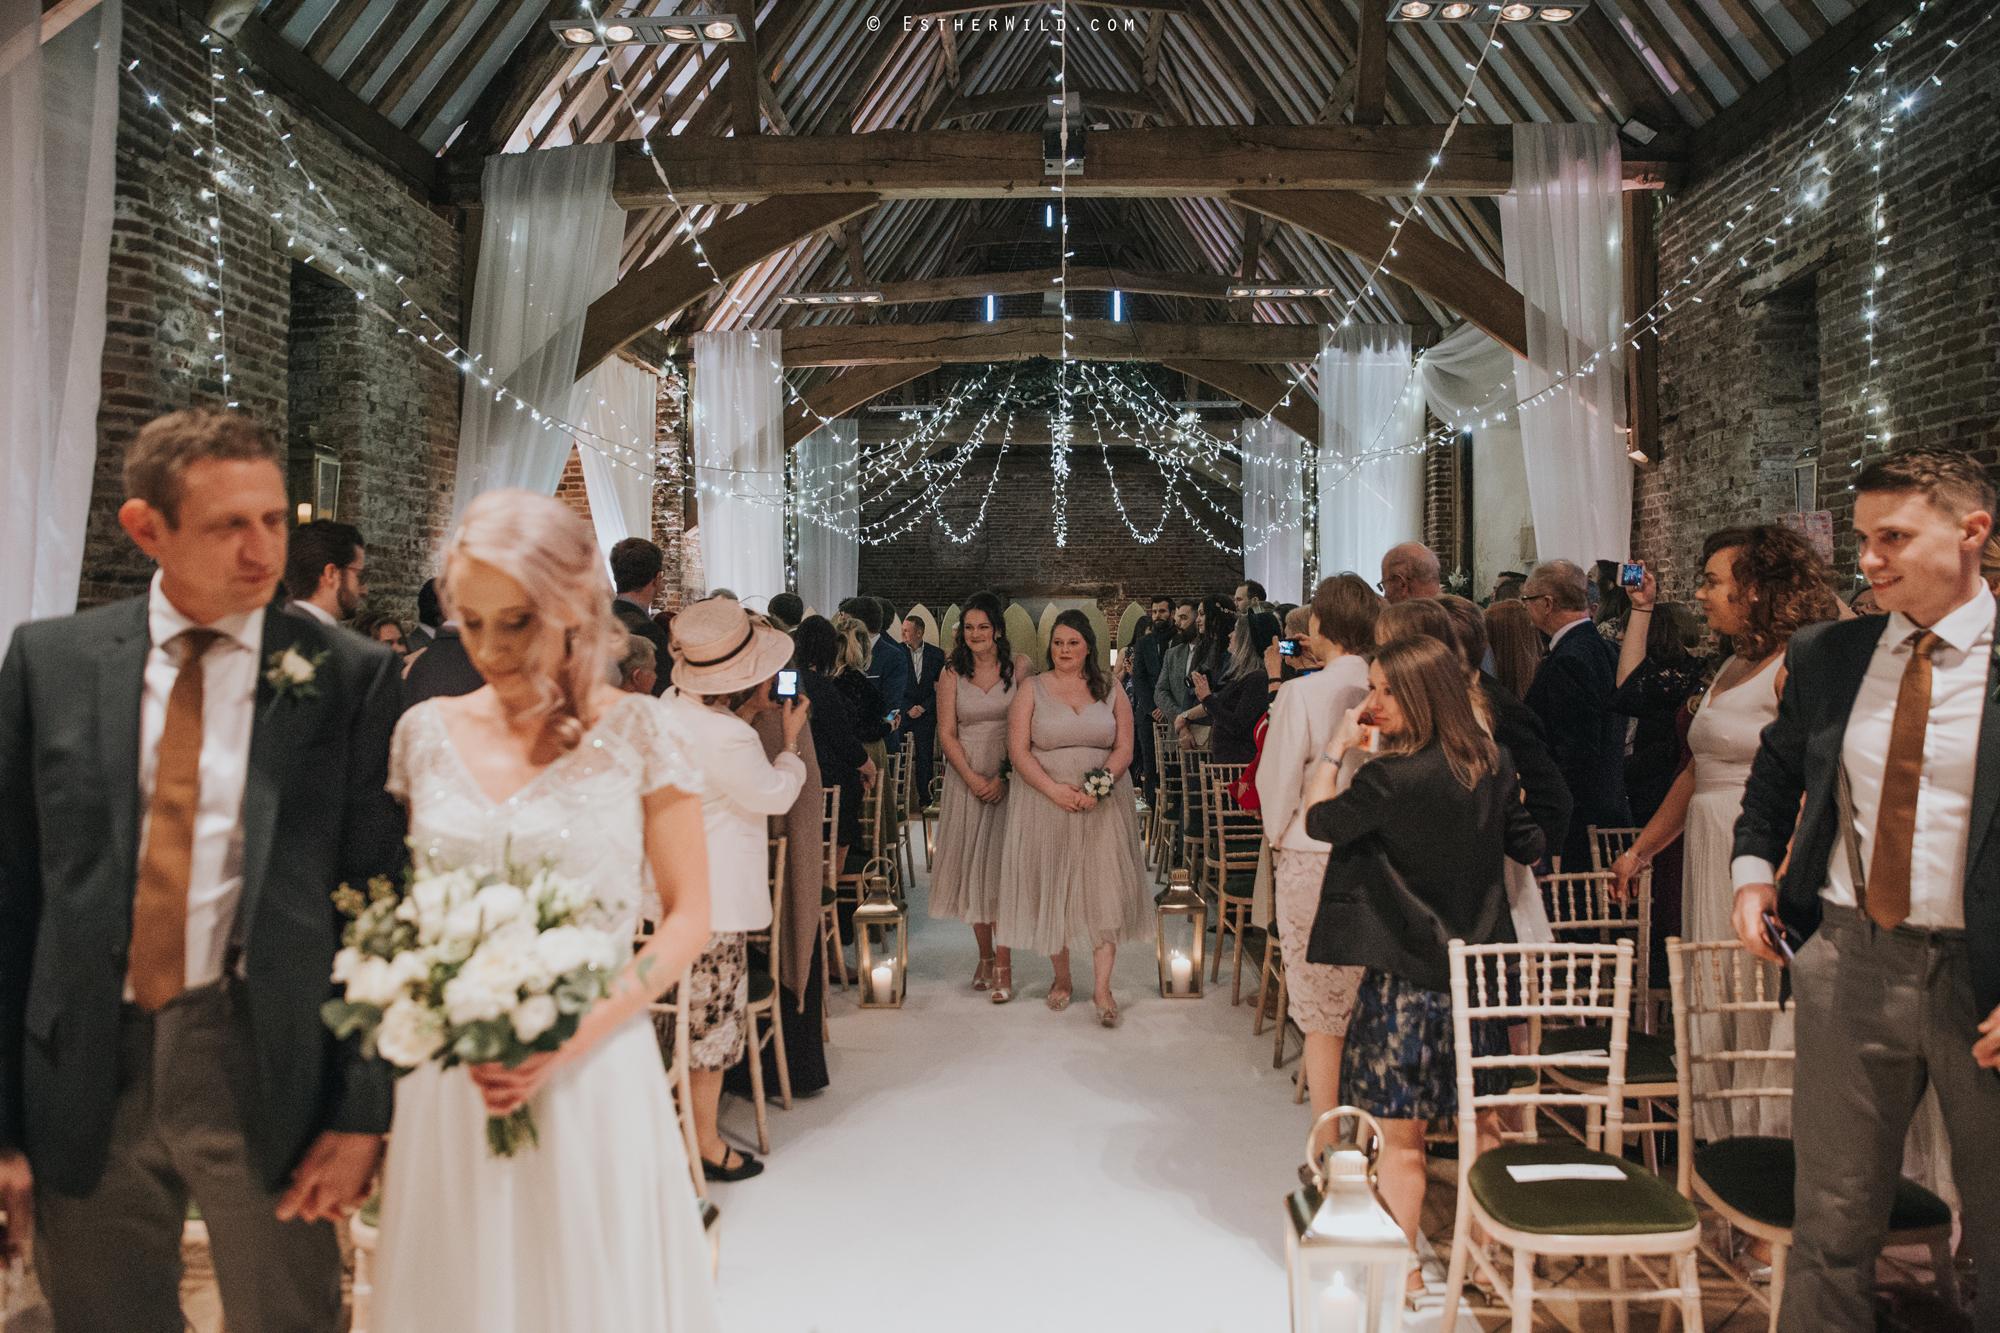 Elms_Barn_Weddings_Suffolk_Photographer_Copyright_Esther_Wild_IMG_1082.jpg